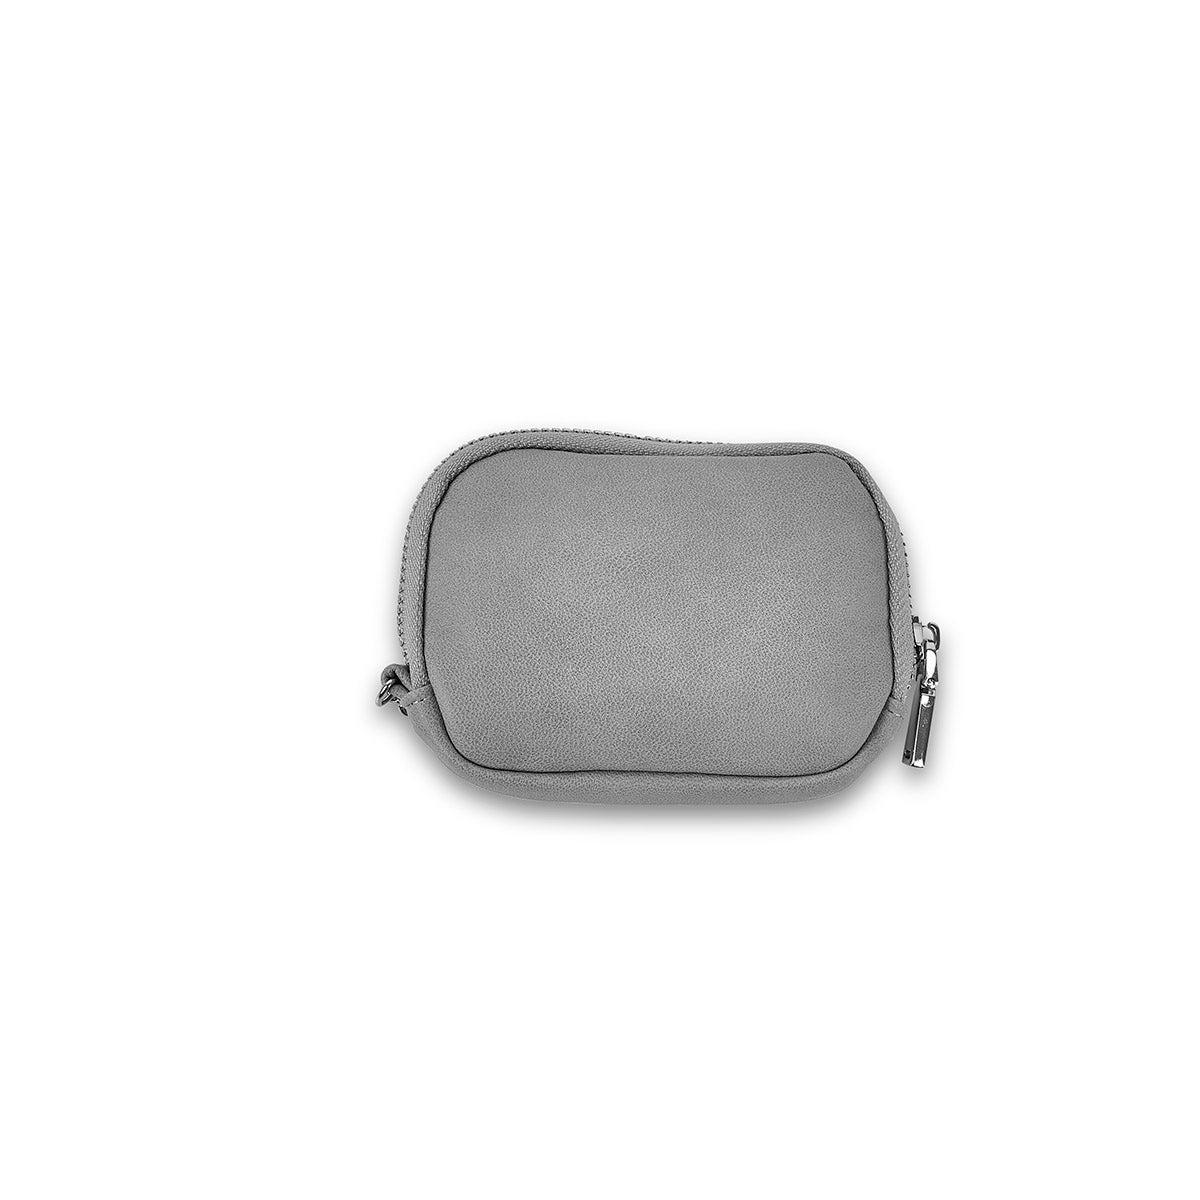 Lds grey coin key cardcase